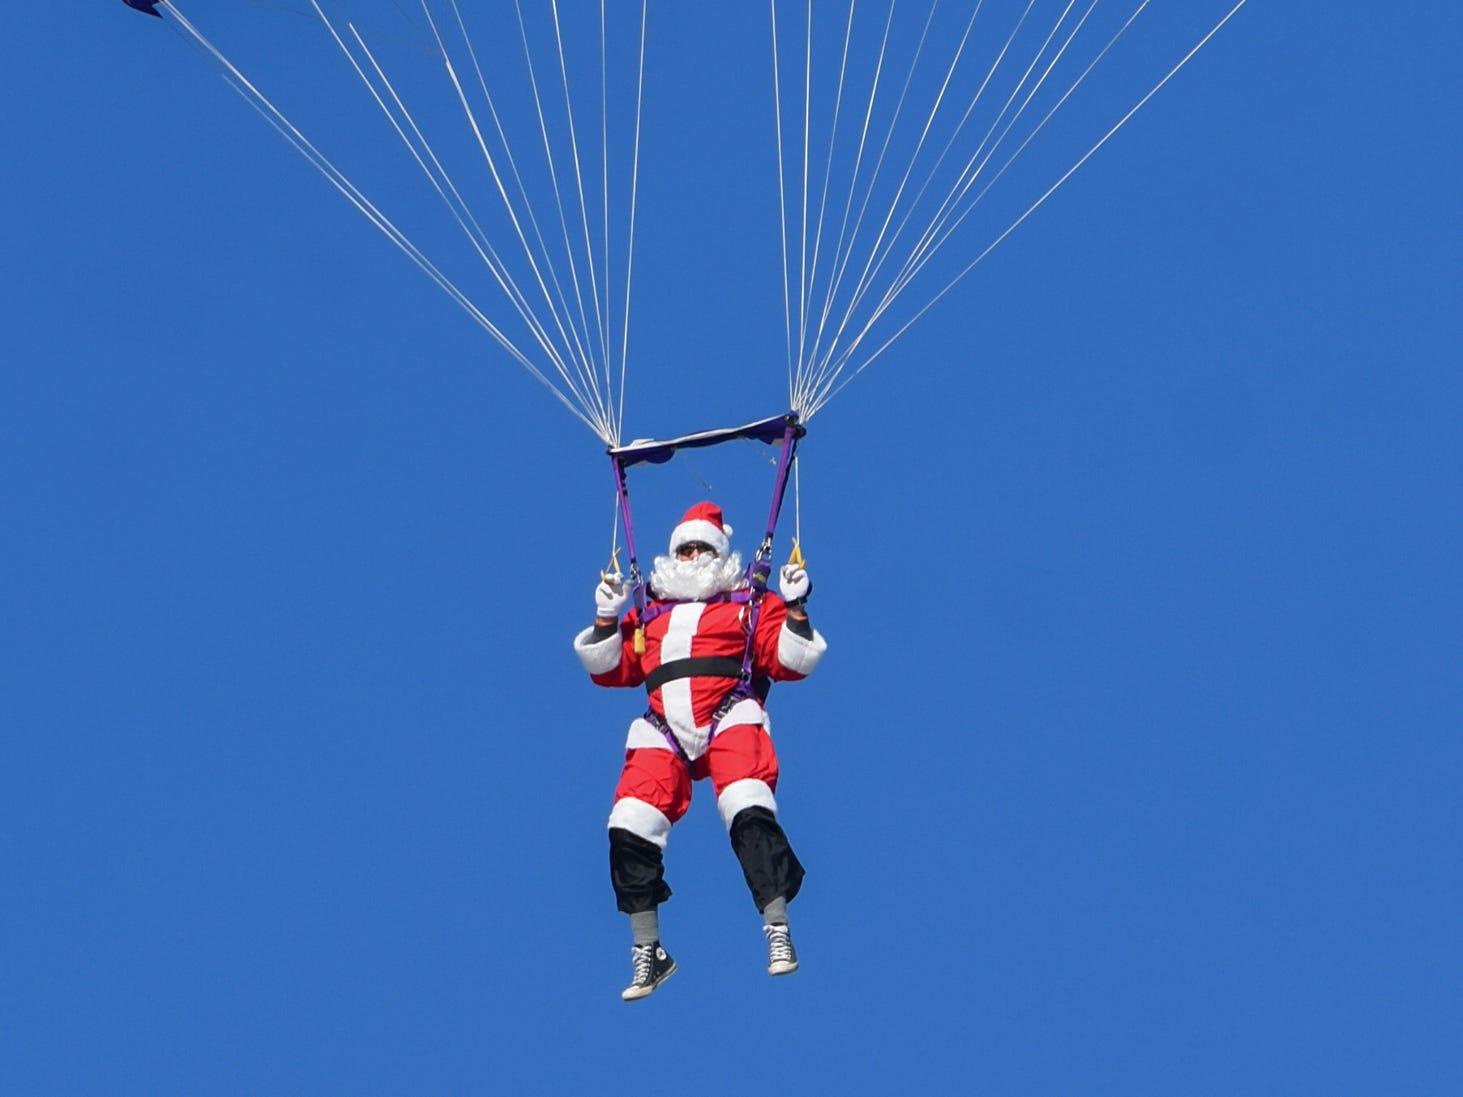 Chuck Bigler, dressed as Santa Claus, makes his way for a landing during the annual Santa Drop at Veterans Memorial Stadium in Shenandoah, Pa., on Friday, Nov. 23, 2018.